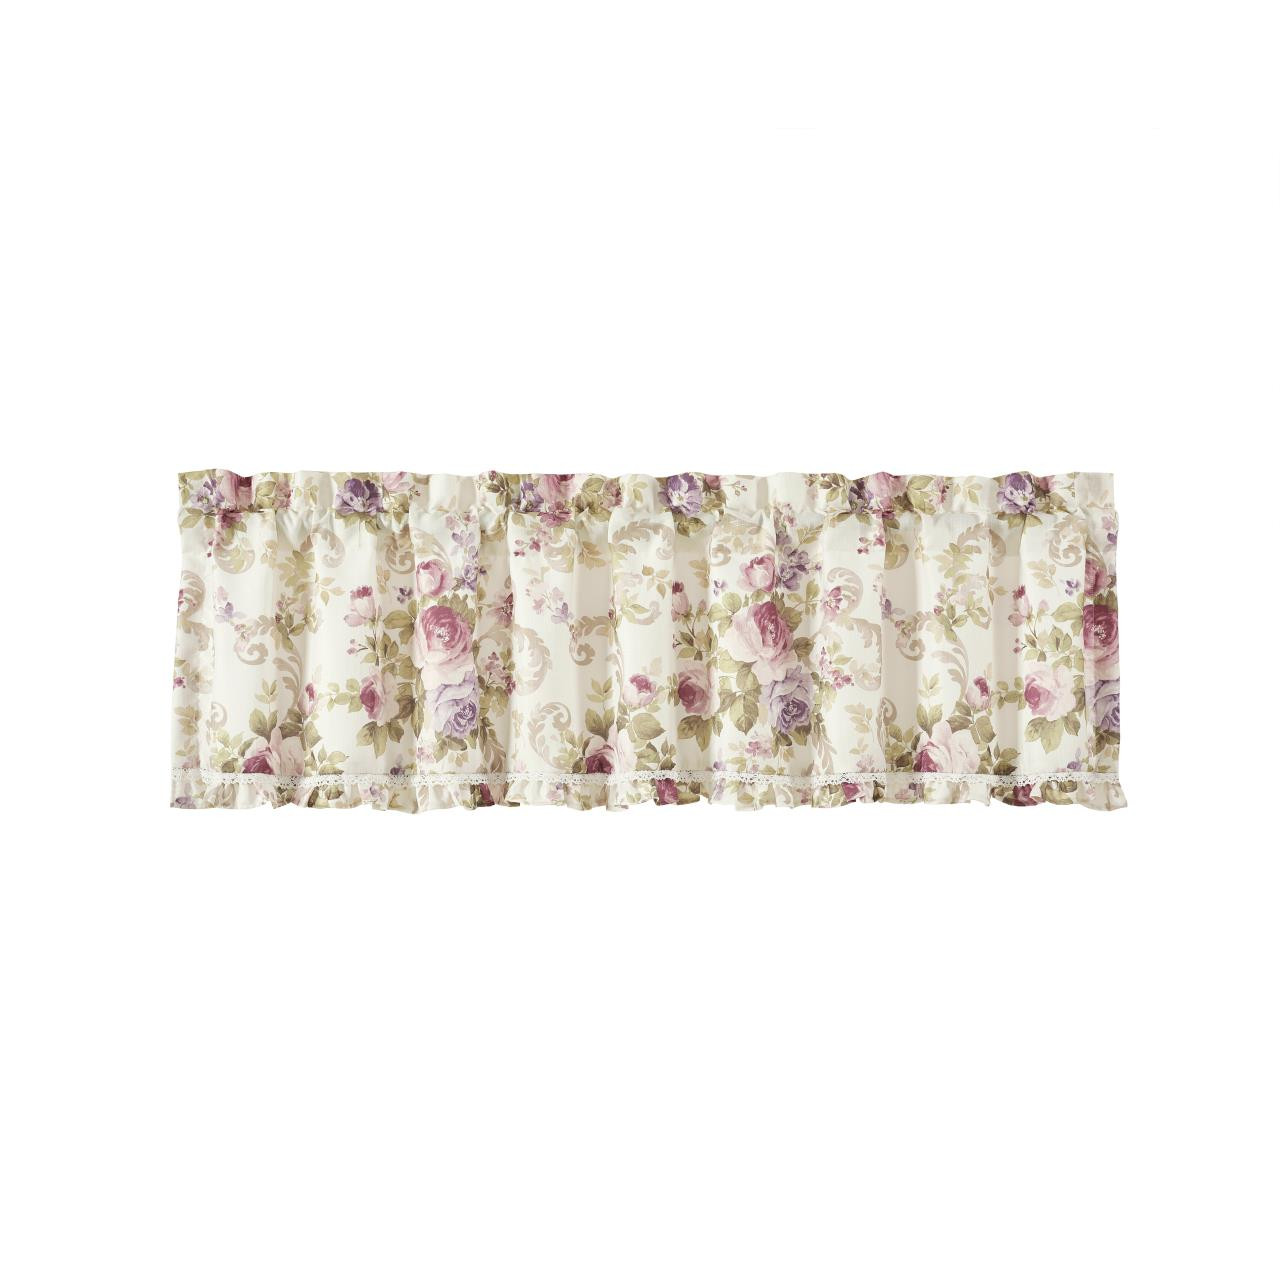 Chambord Lavender Straight Valance - 193842102374